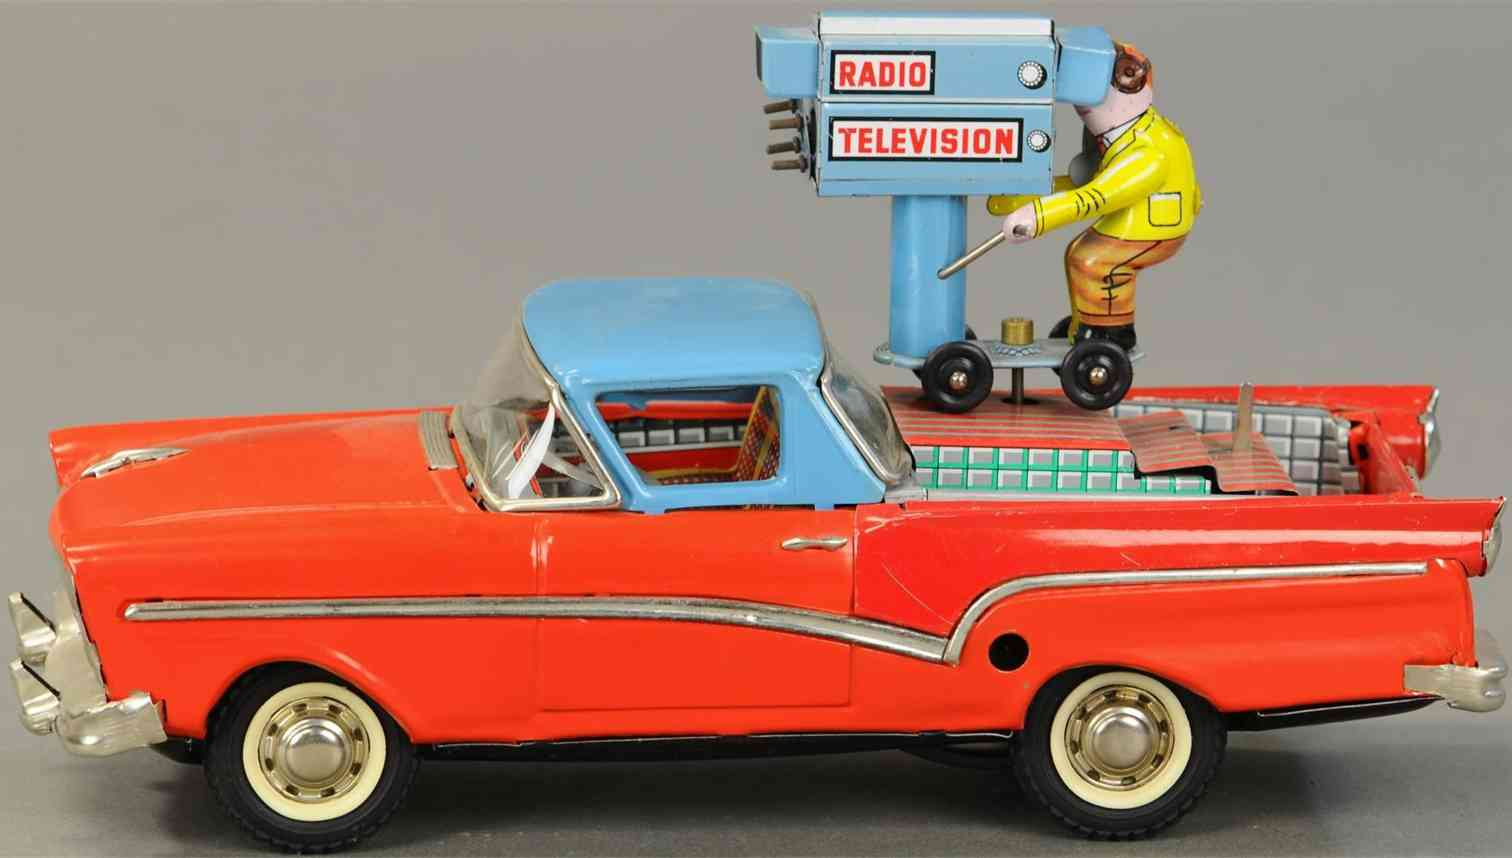 joustra tin toy radio television car friction operated keywind cameraman